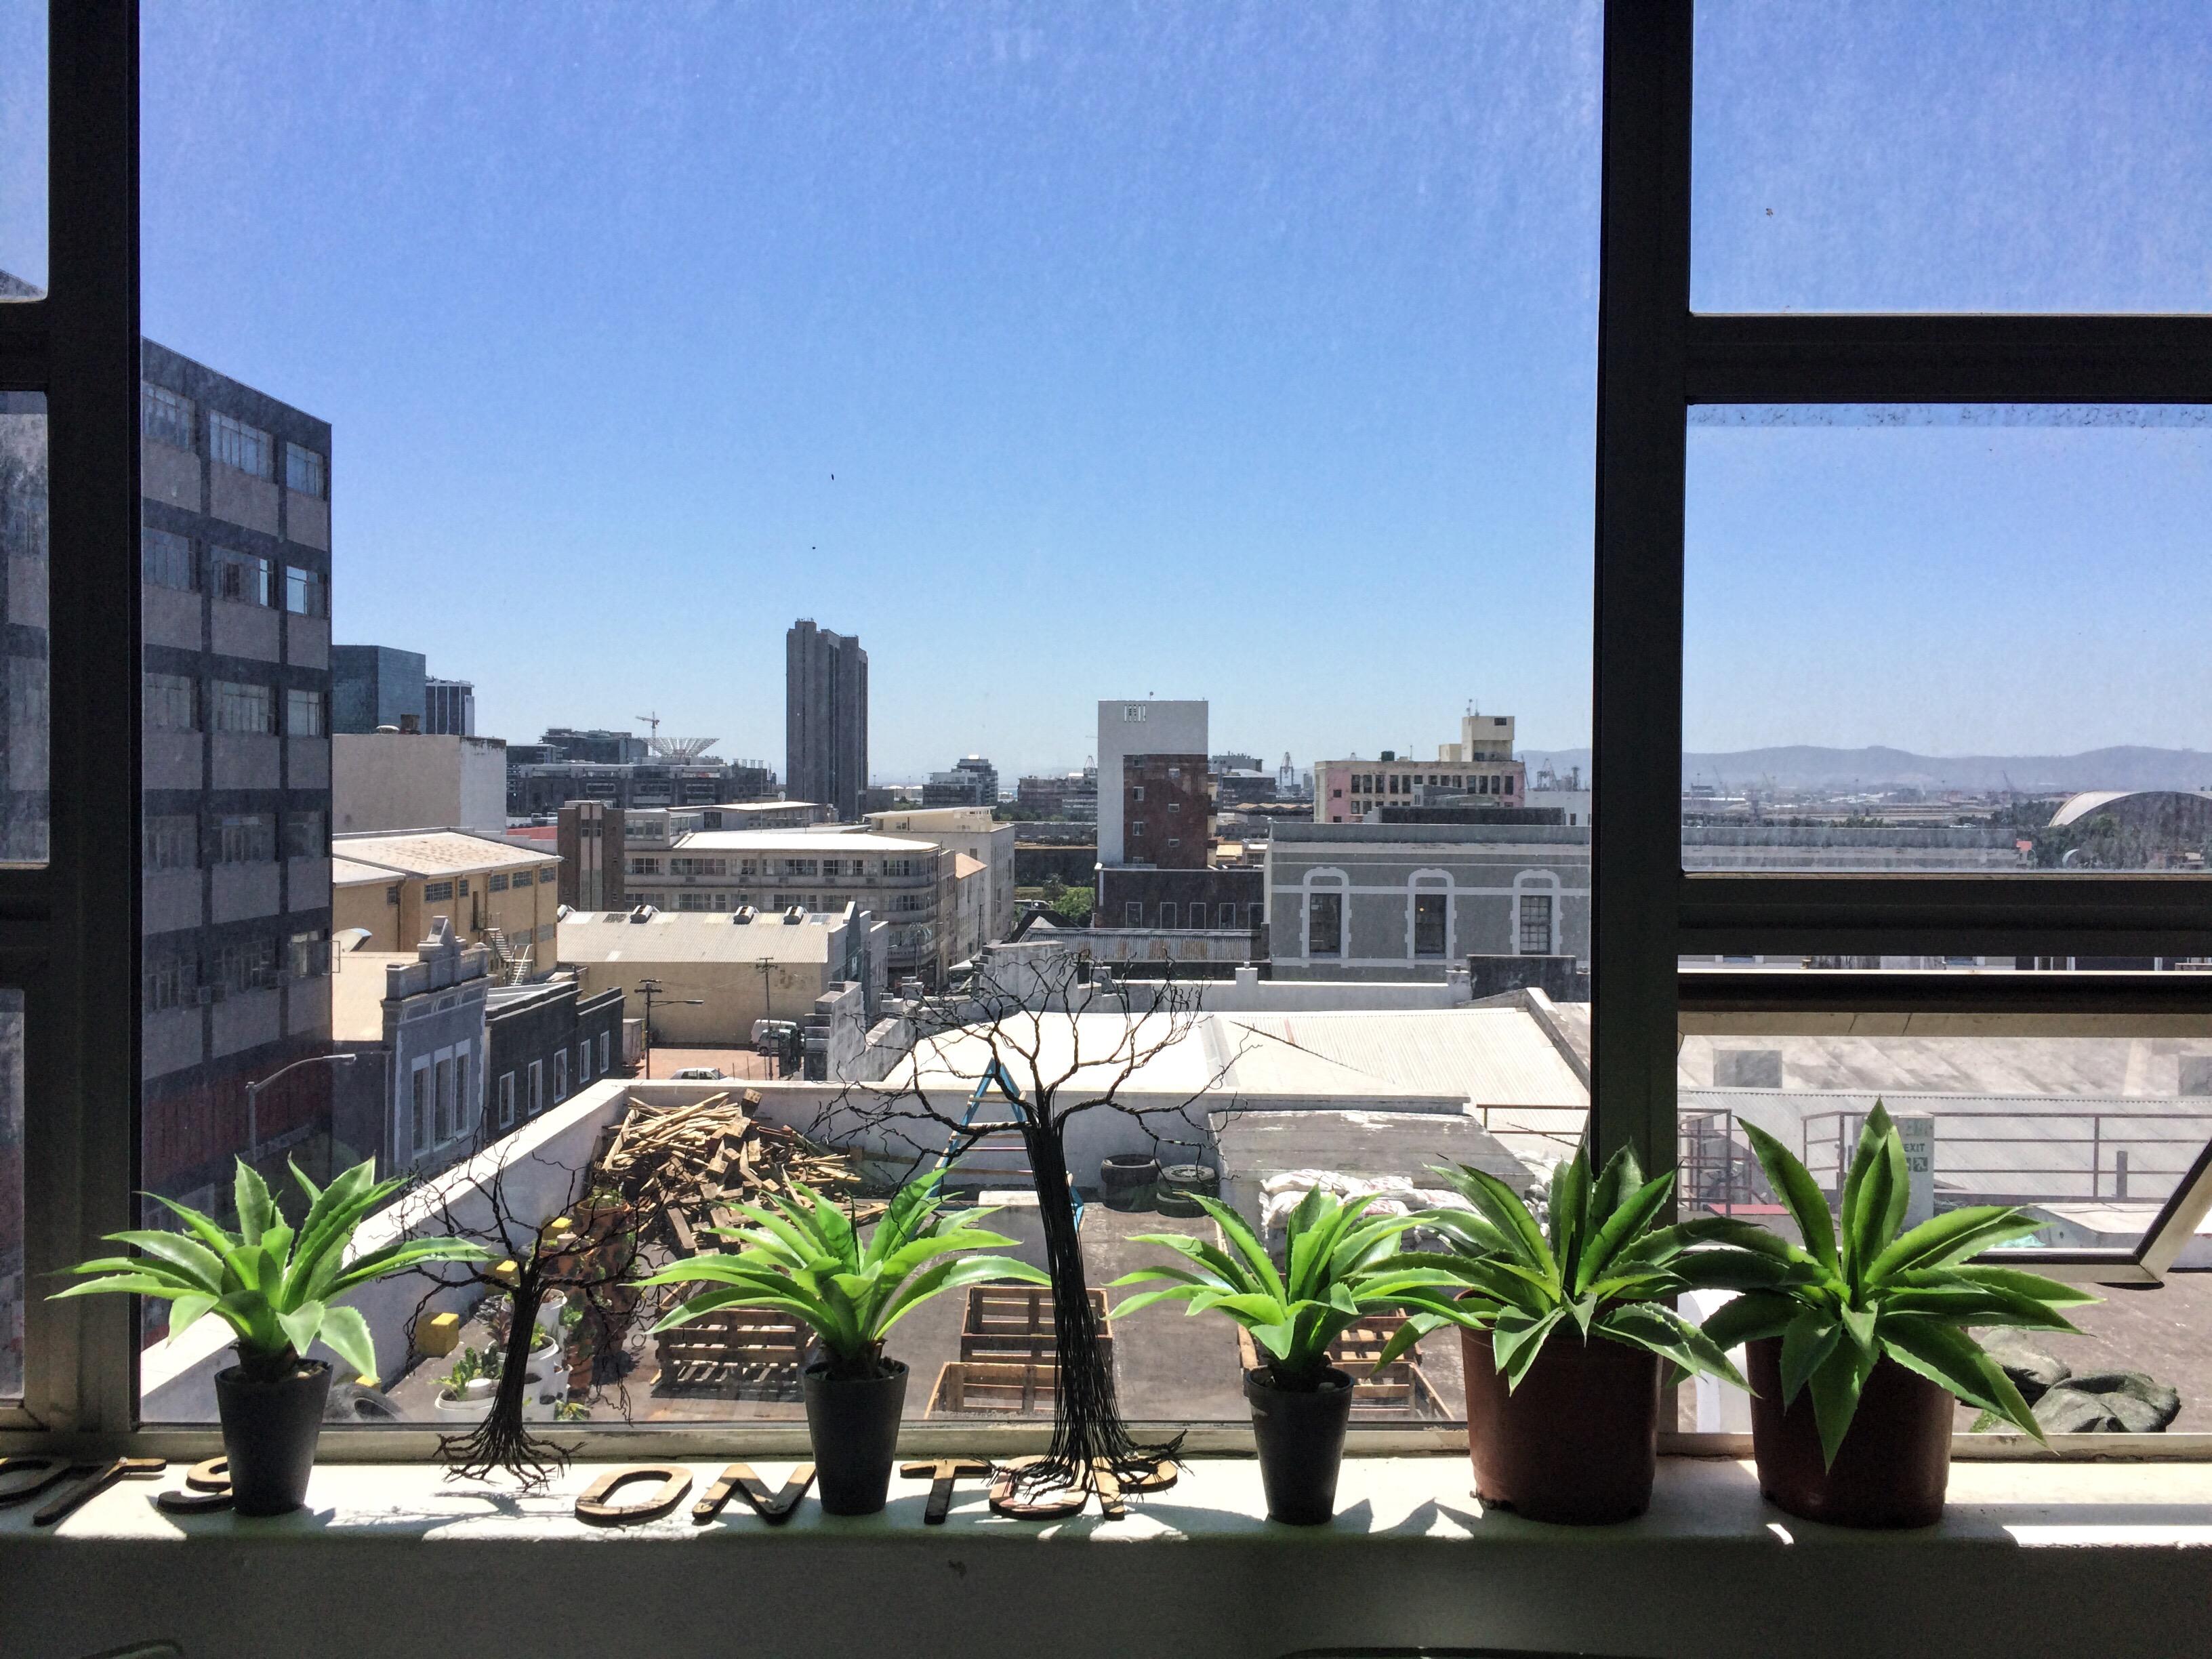 Plants soaking up the sun - 75 Harrington Street, Cape Town